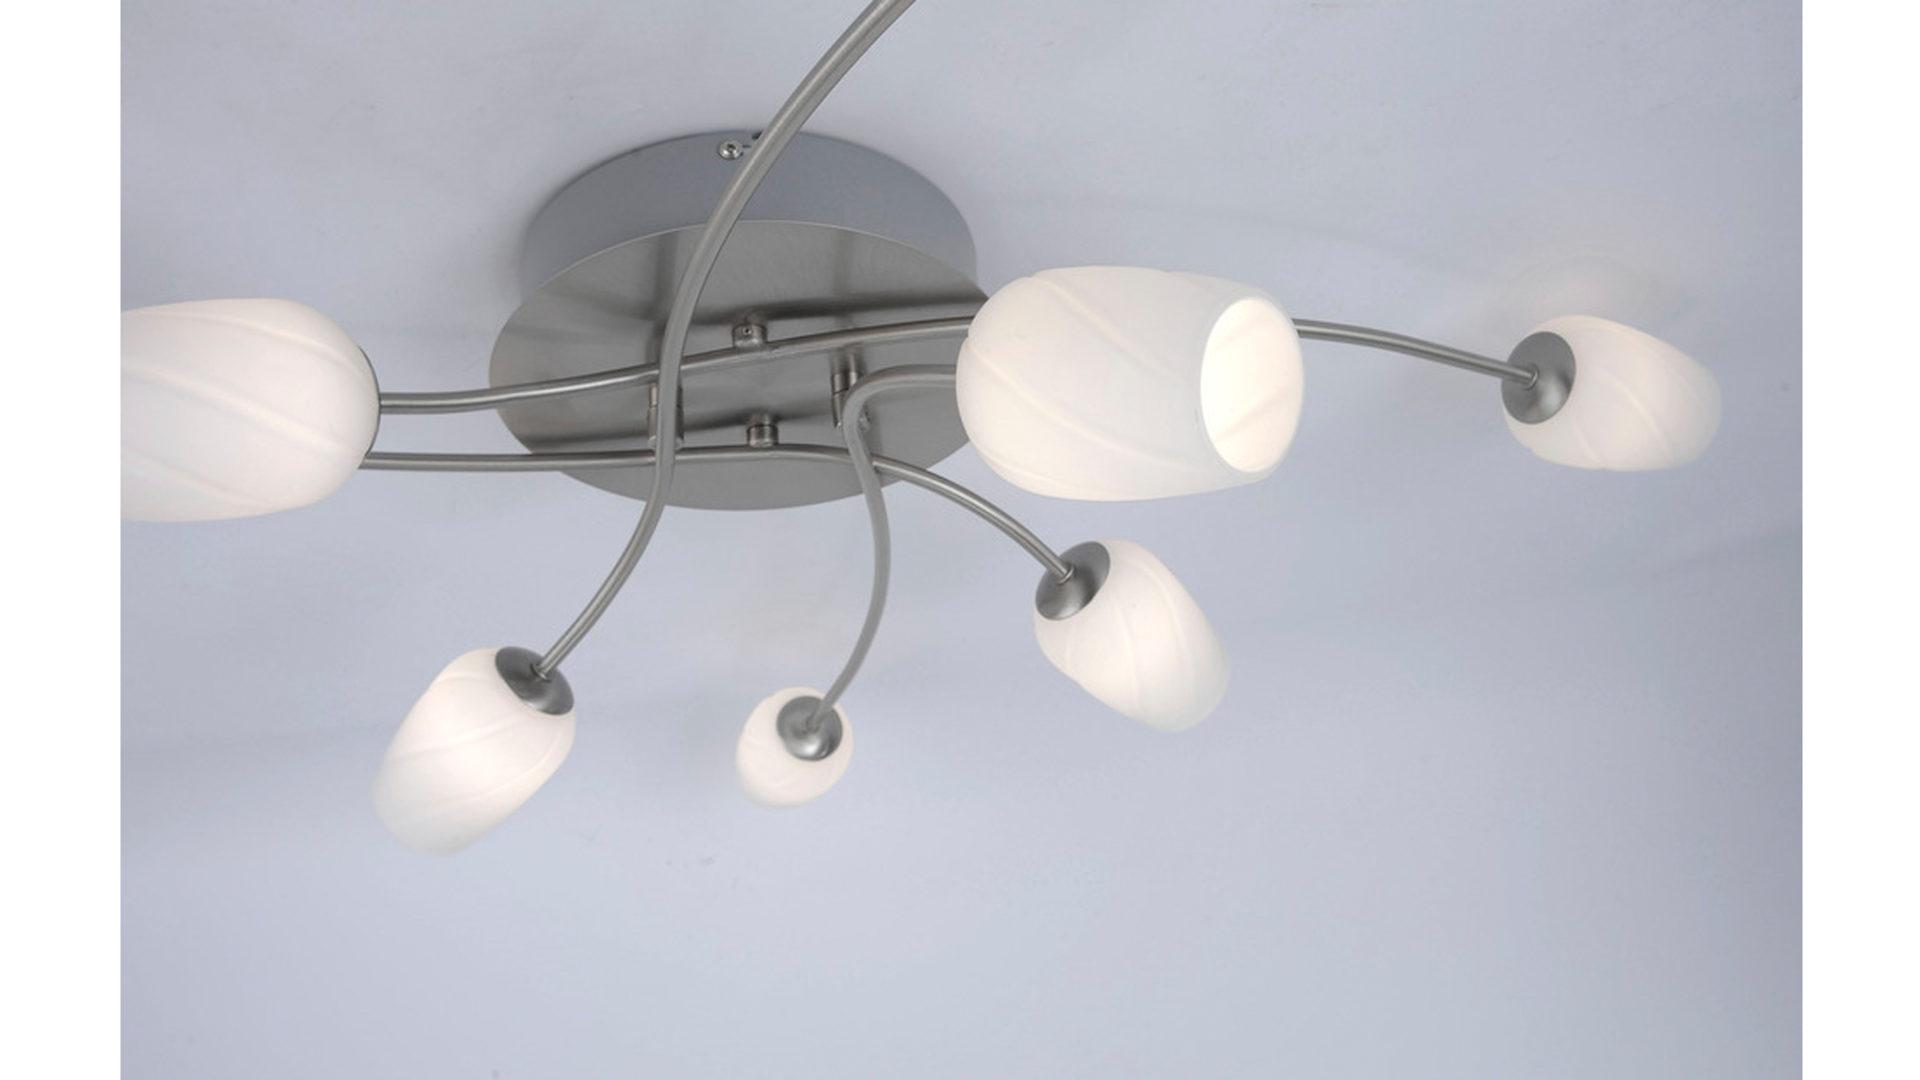 Paul Neuhaus Leuchten Werksverkauf Paul Neuhaus Lampen Led Schirm